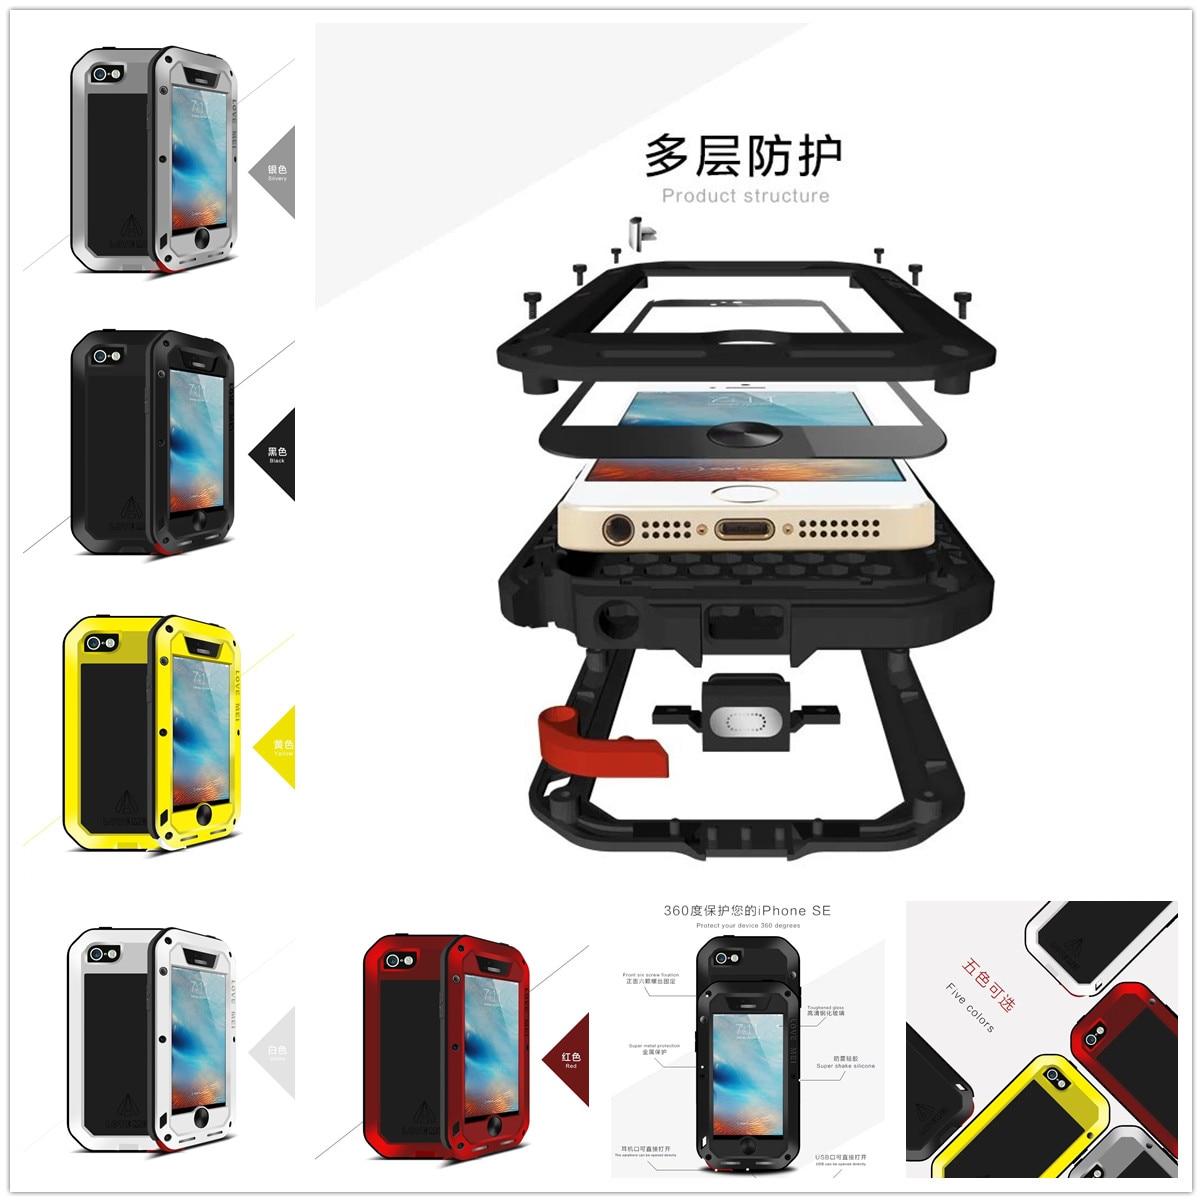 imágenes para Para el iphone de Apple SO iPhone 5S Original Amor Mei Tak Spuer Impermeable Caja De Aluminio gorilla glass + Aluminum Metal Armor caso